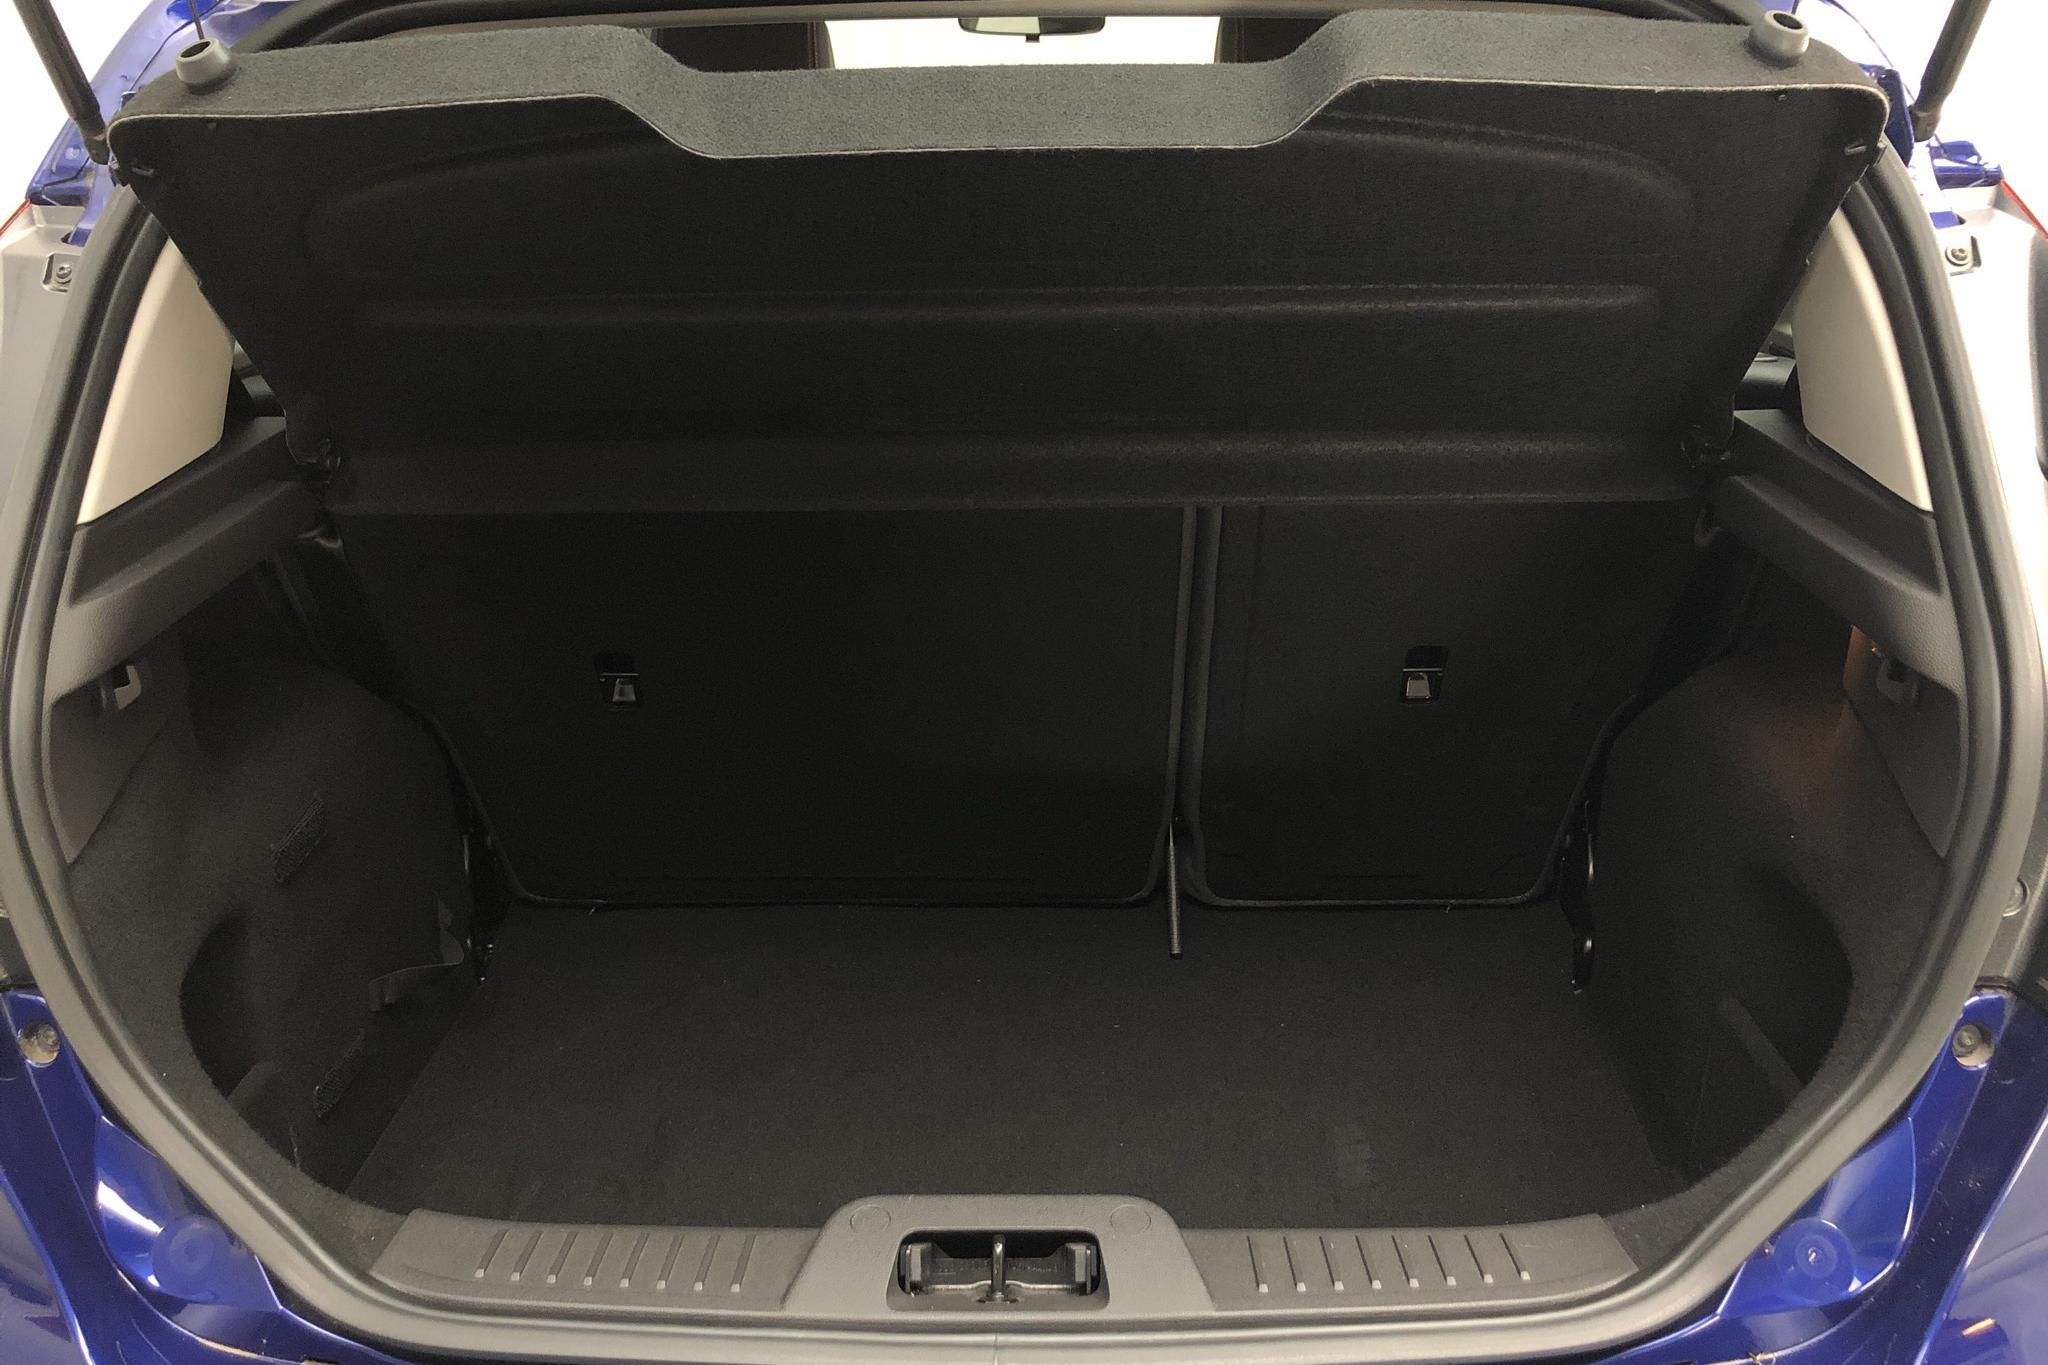 Ford Fiesta 1.0 5dr (80hk) - 3 853 mil - Manuell - blå - 2015